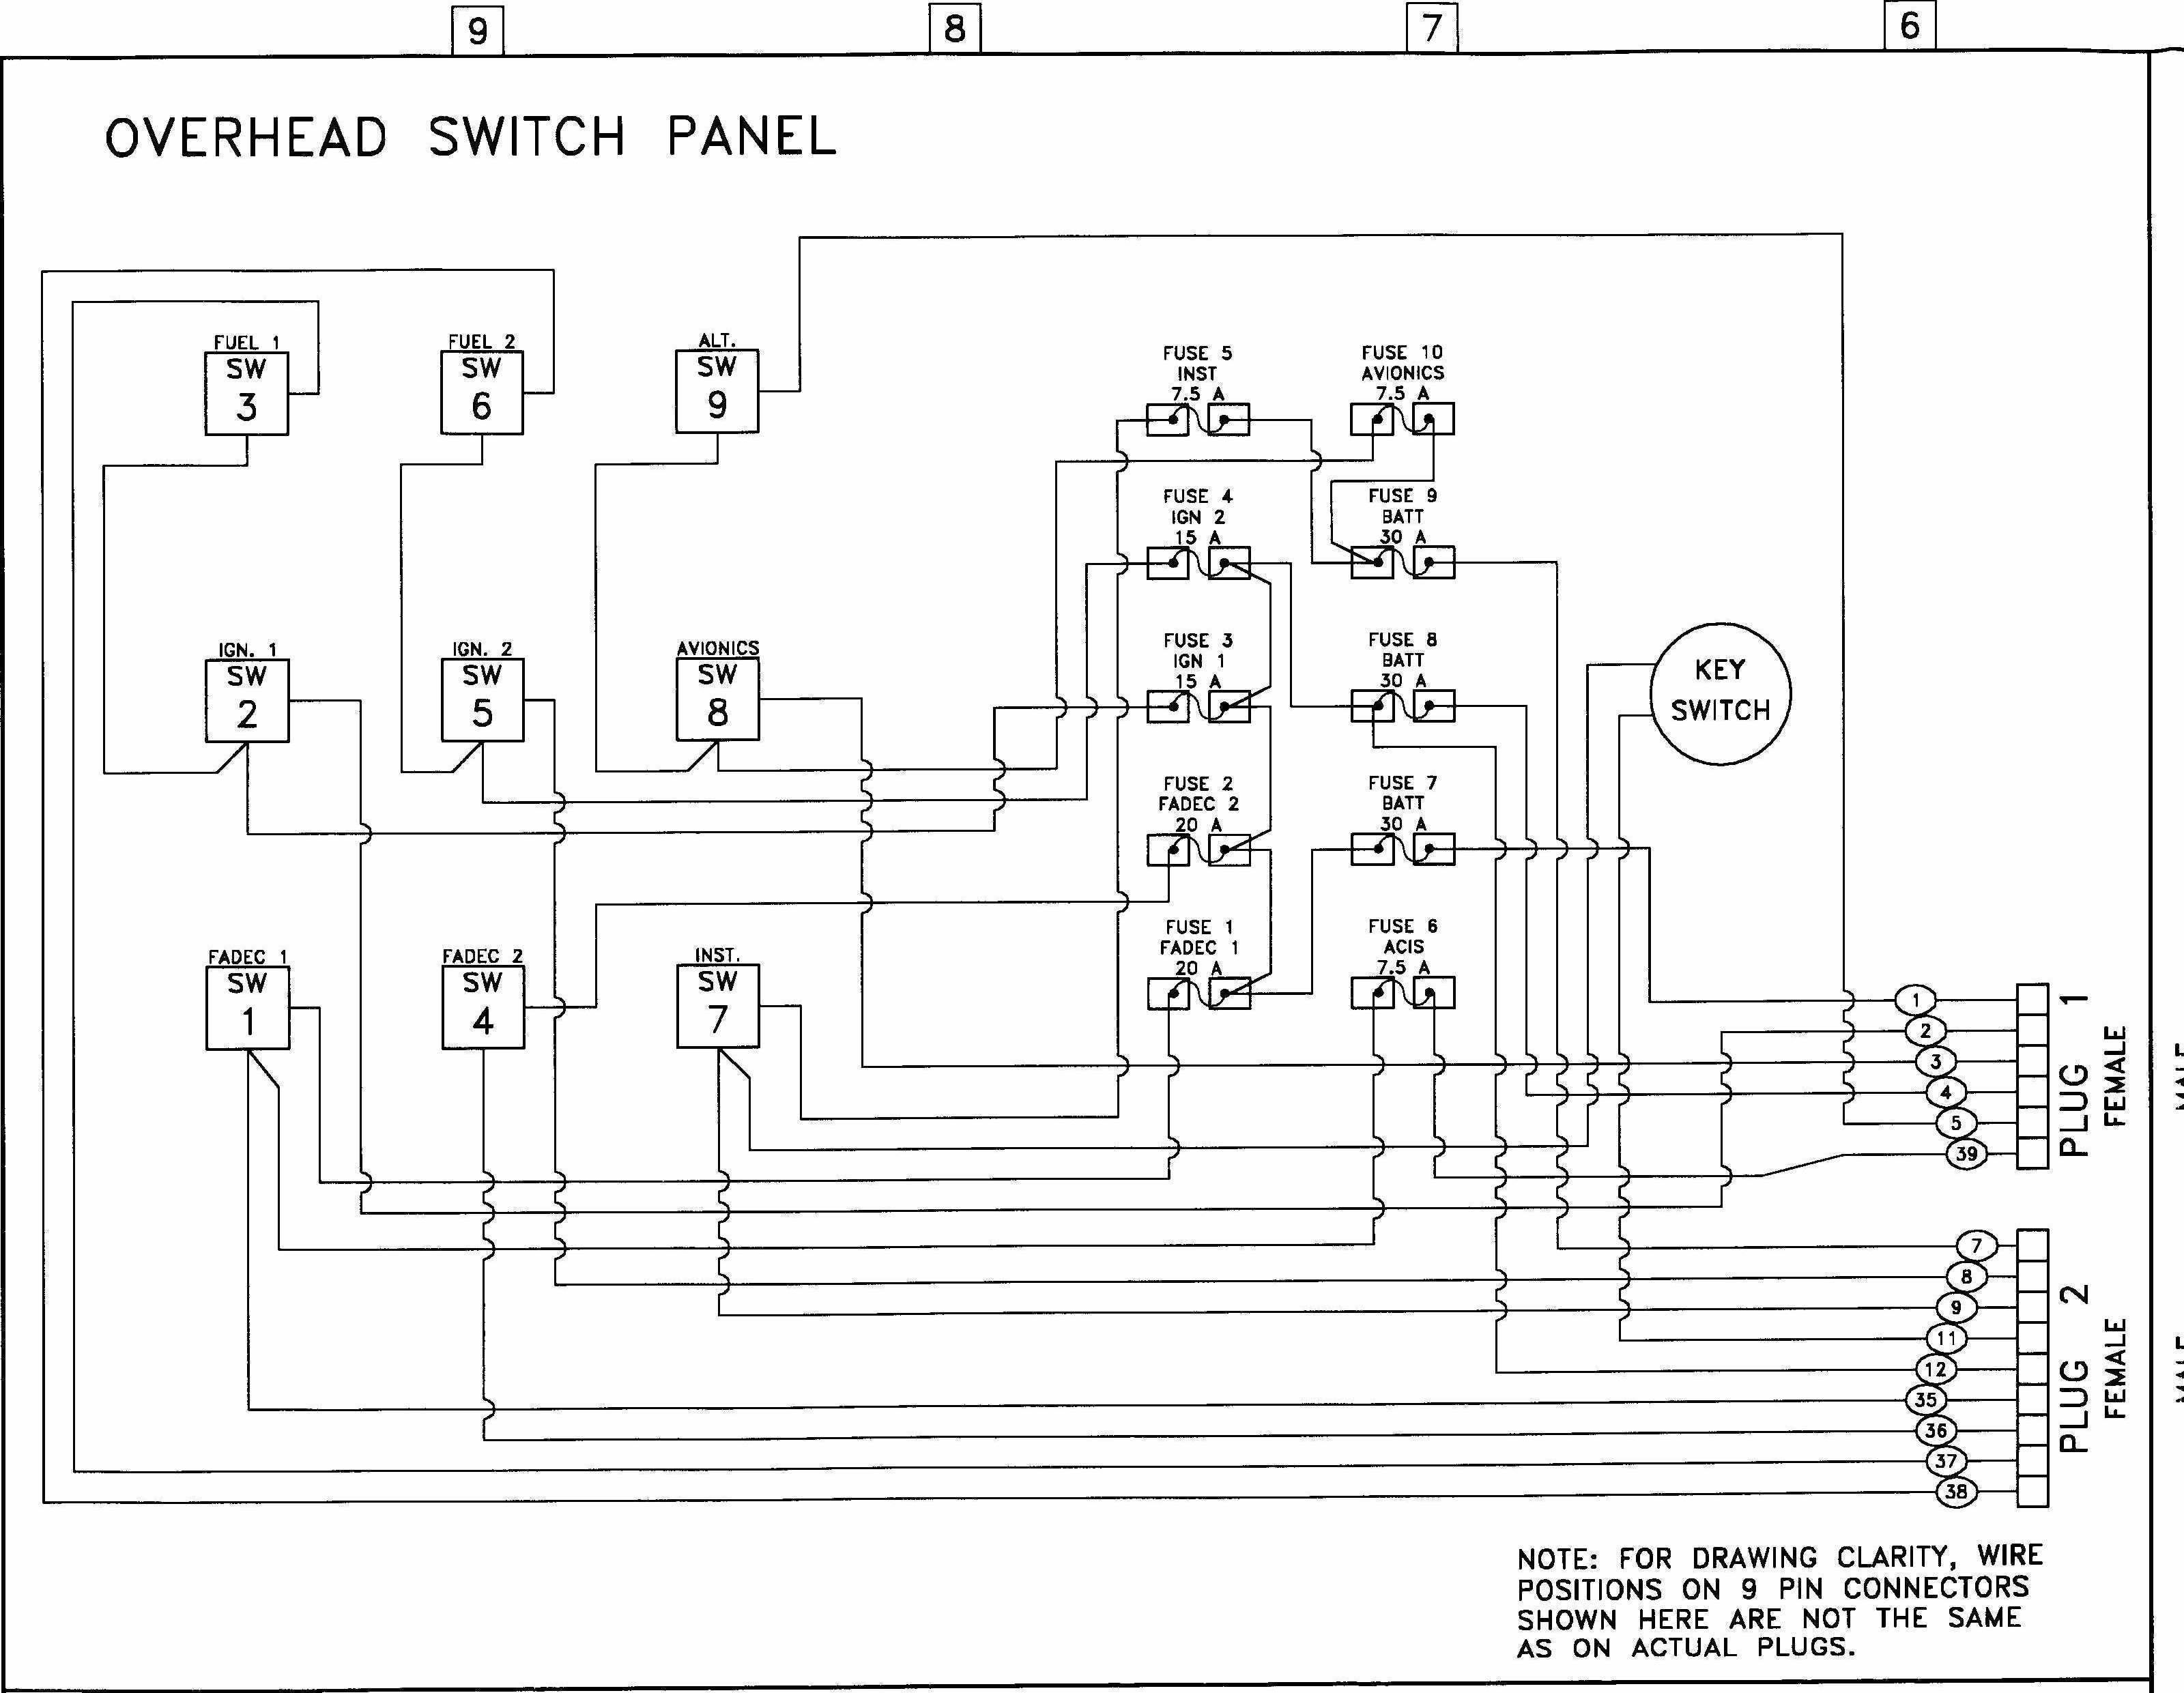 jumper wiring diagram auto electrical wiring diagram u2022 rh softwarekart co Electrical Schematics Symbols and Meaning Simple Electrical Schematic